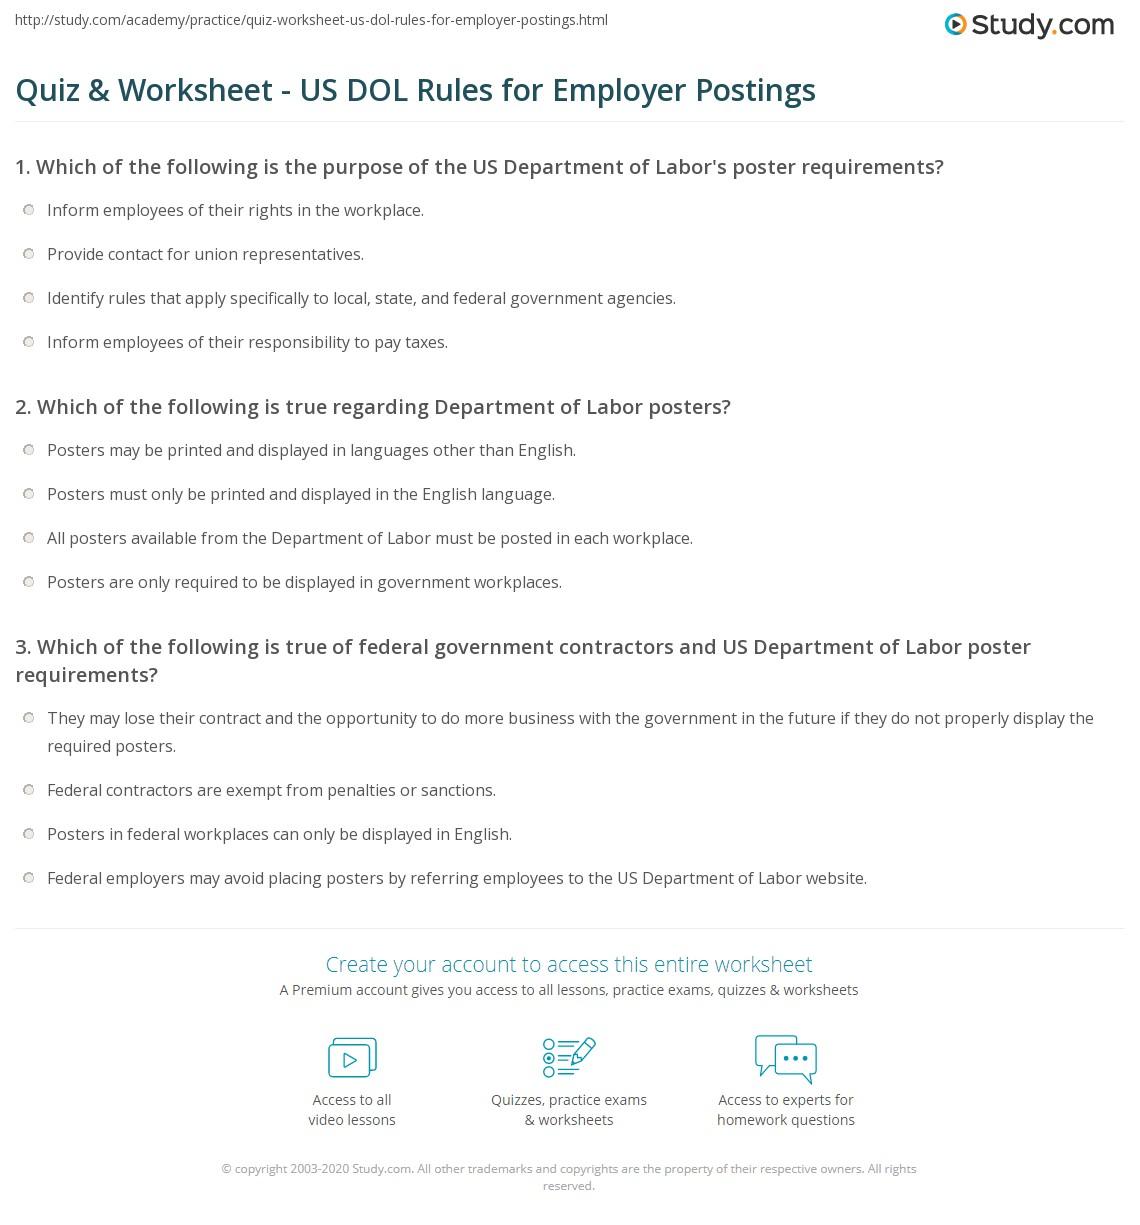 Quiz & Worksheet - US DOL Rules for Employer Postings | Study.com